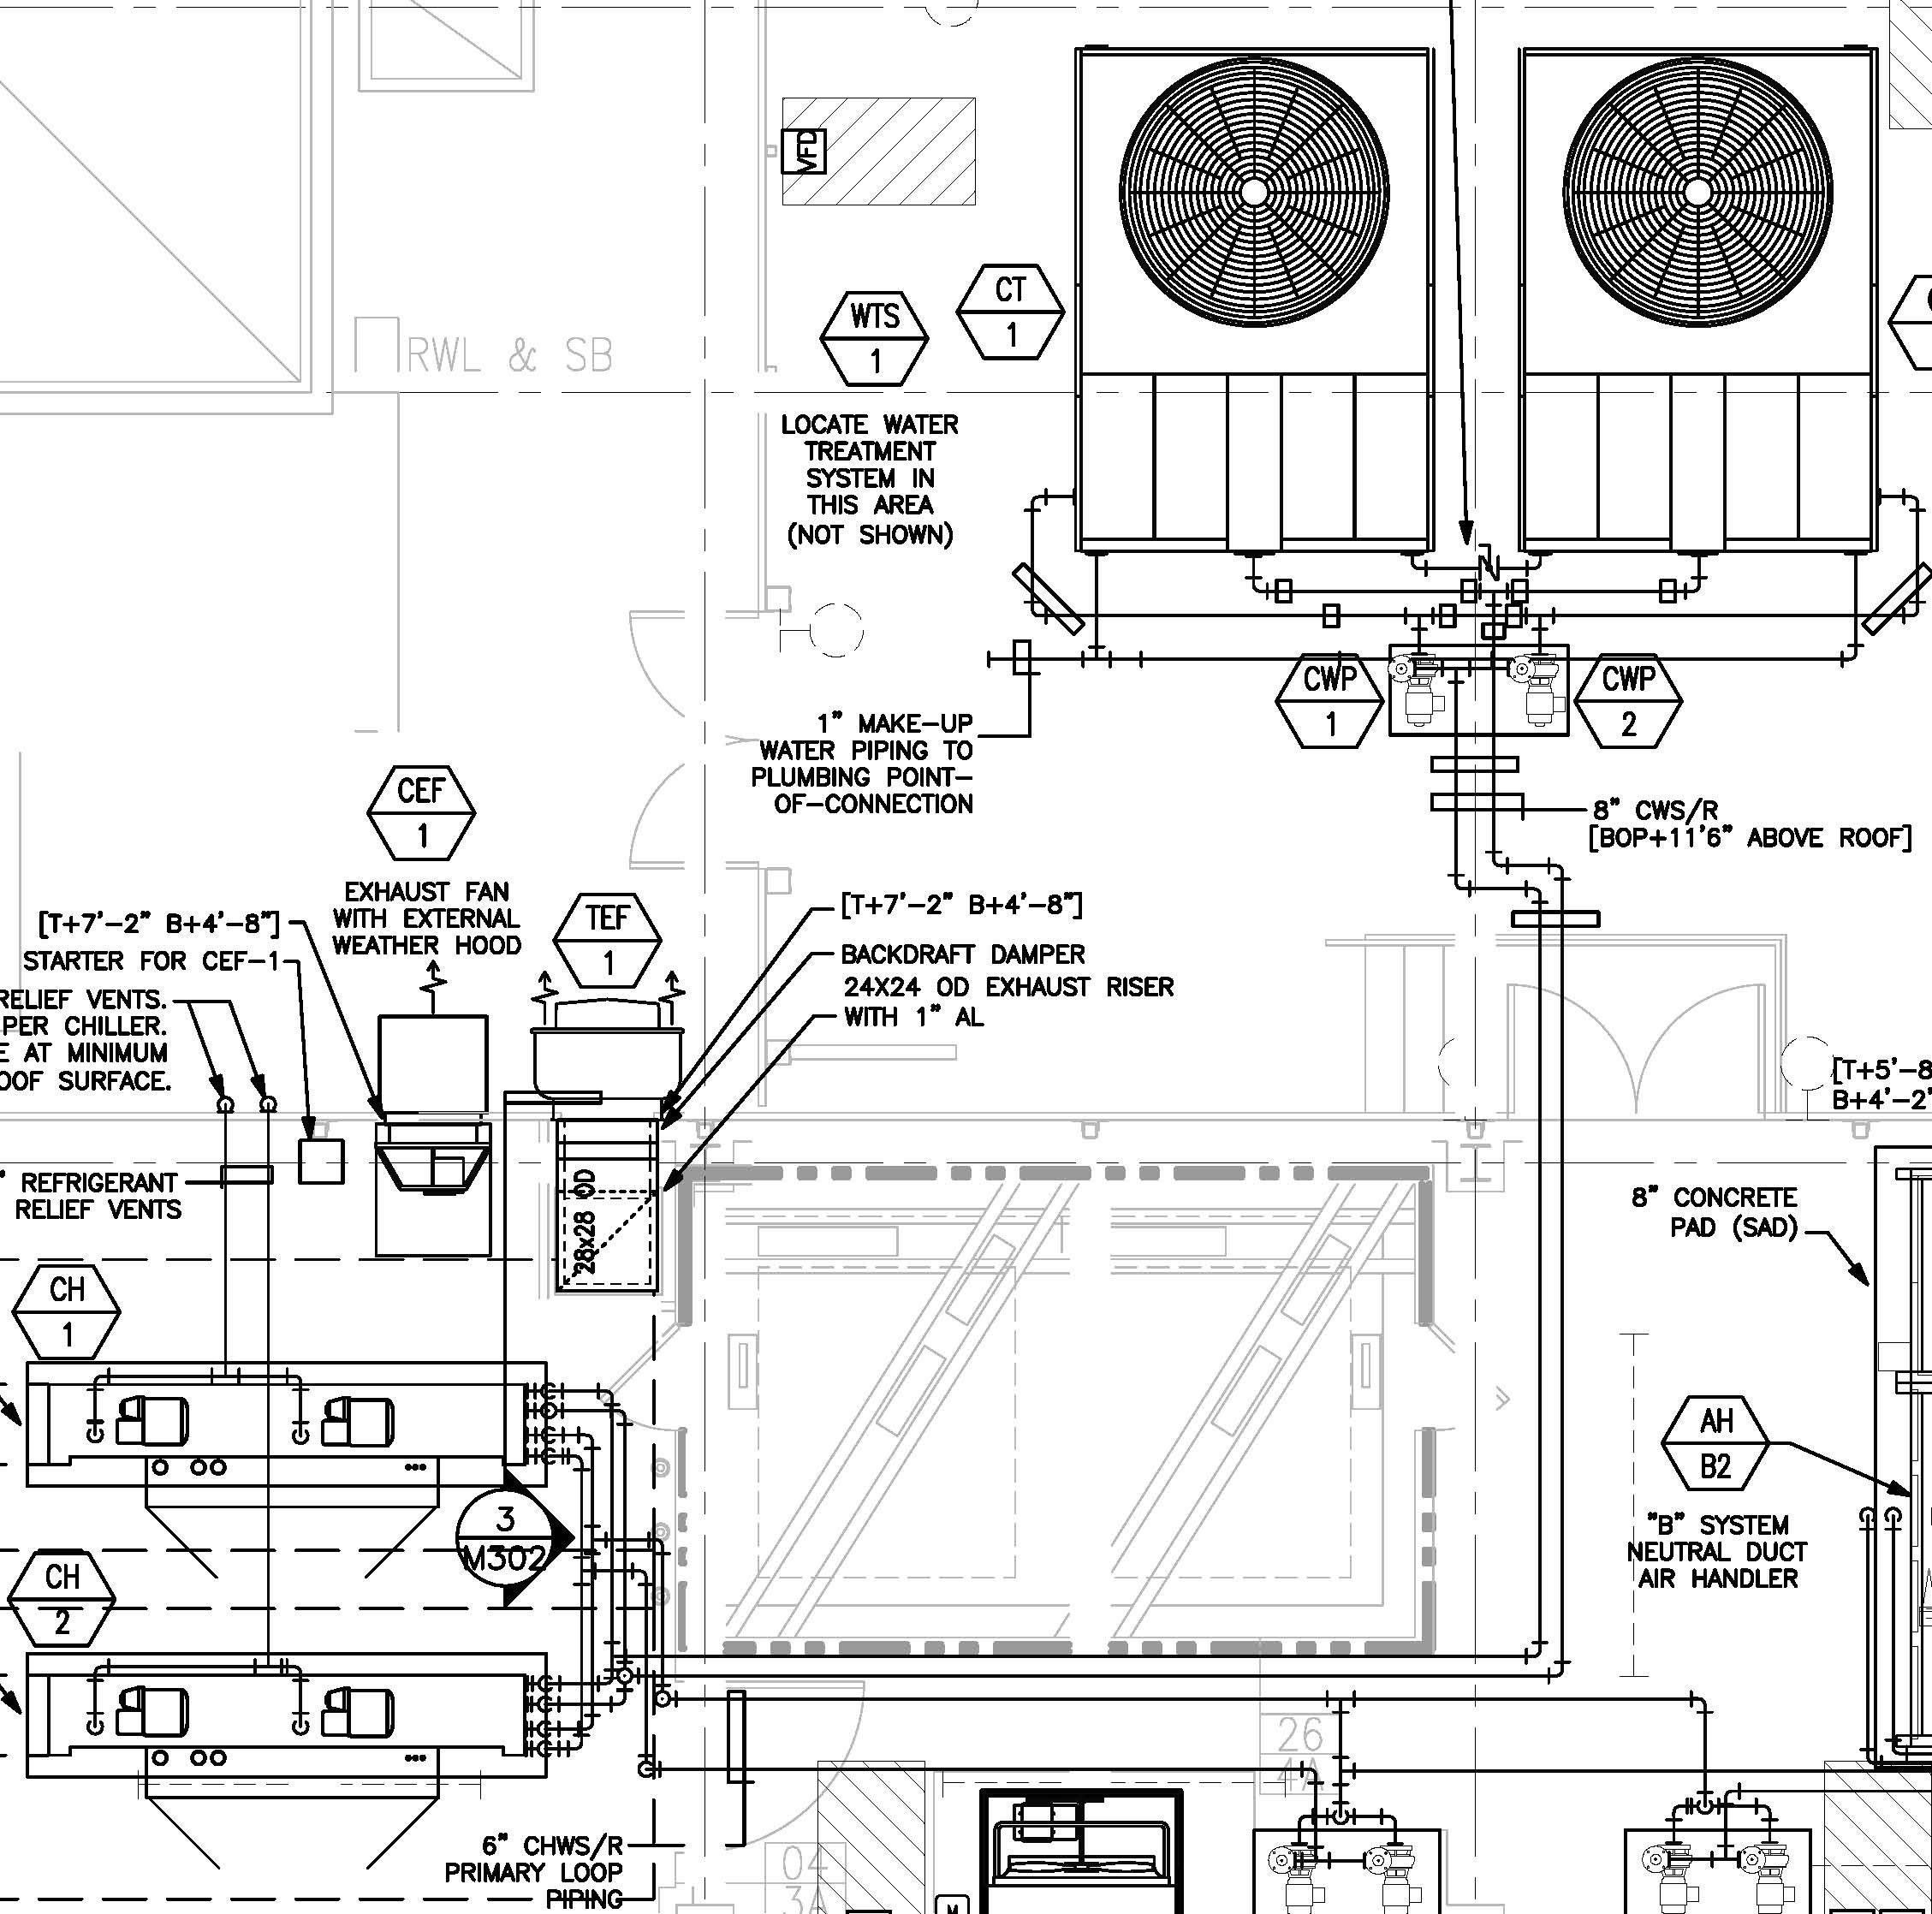 1986 Club Car Ds Schematic Wiring Diagram Garage Design Craftsman Garage Door Opener Craftsman Garage Door